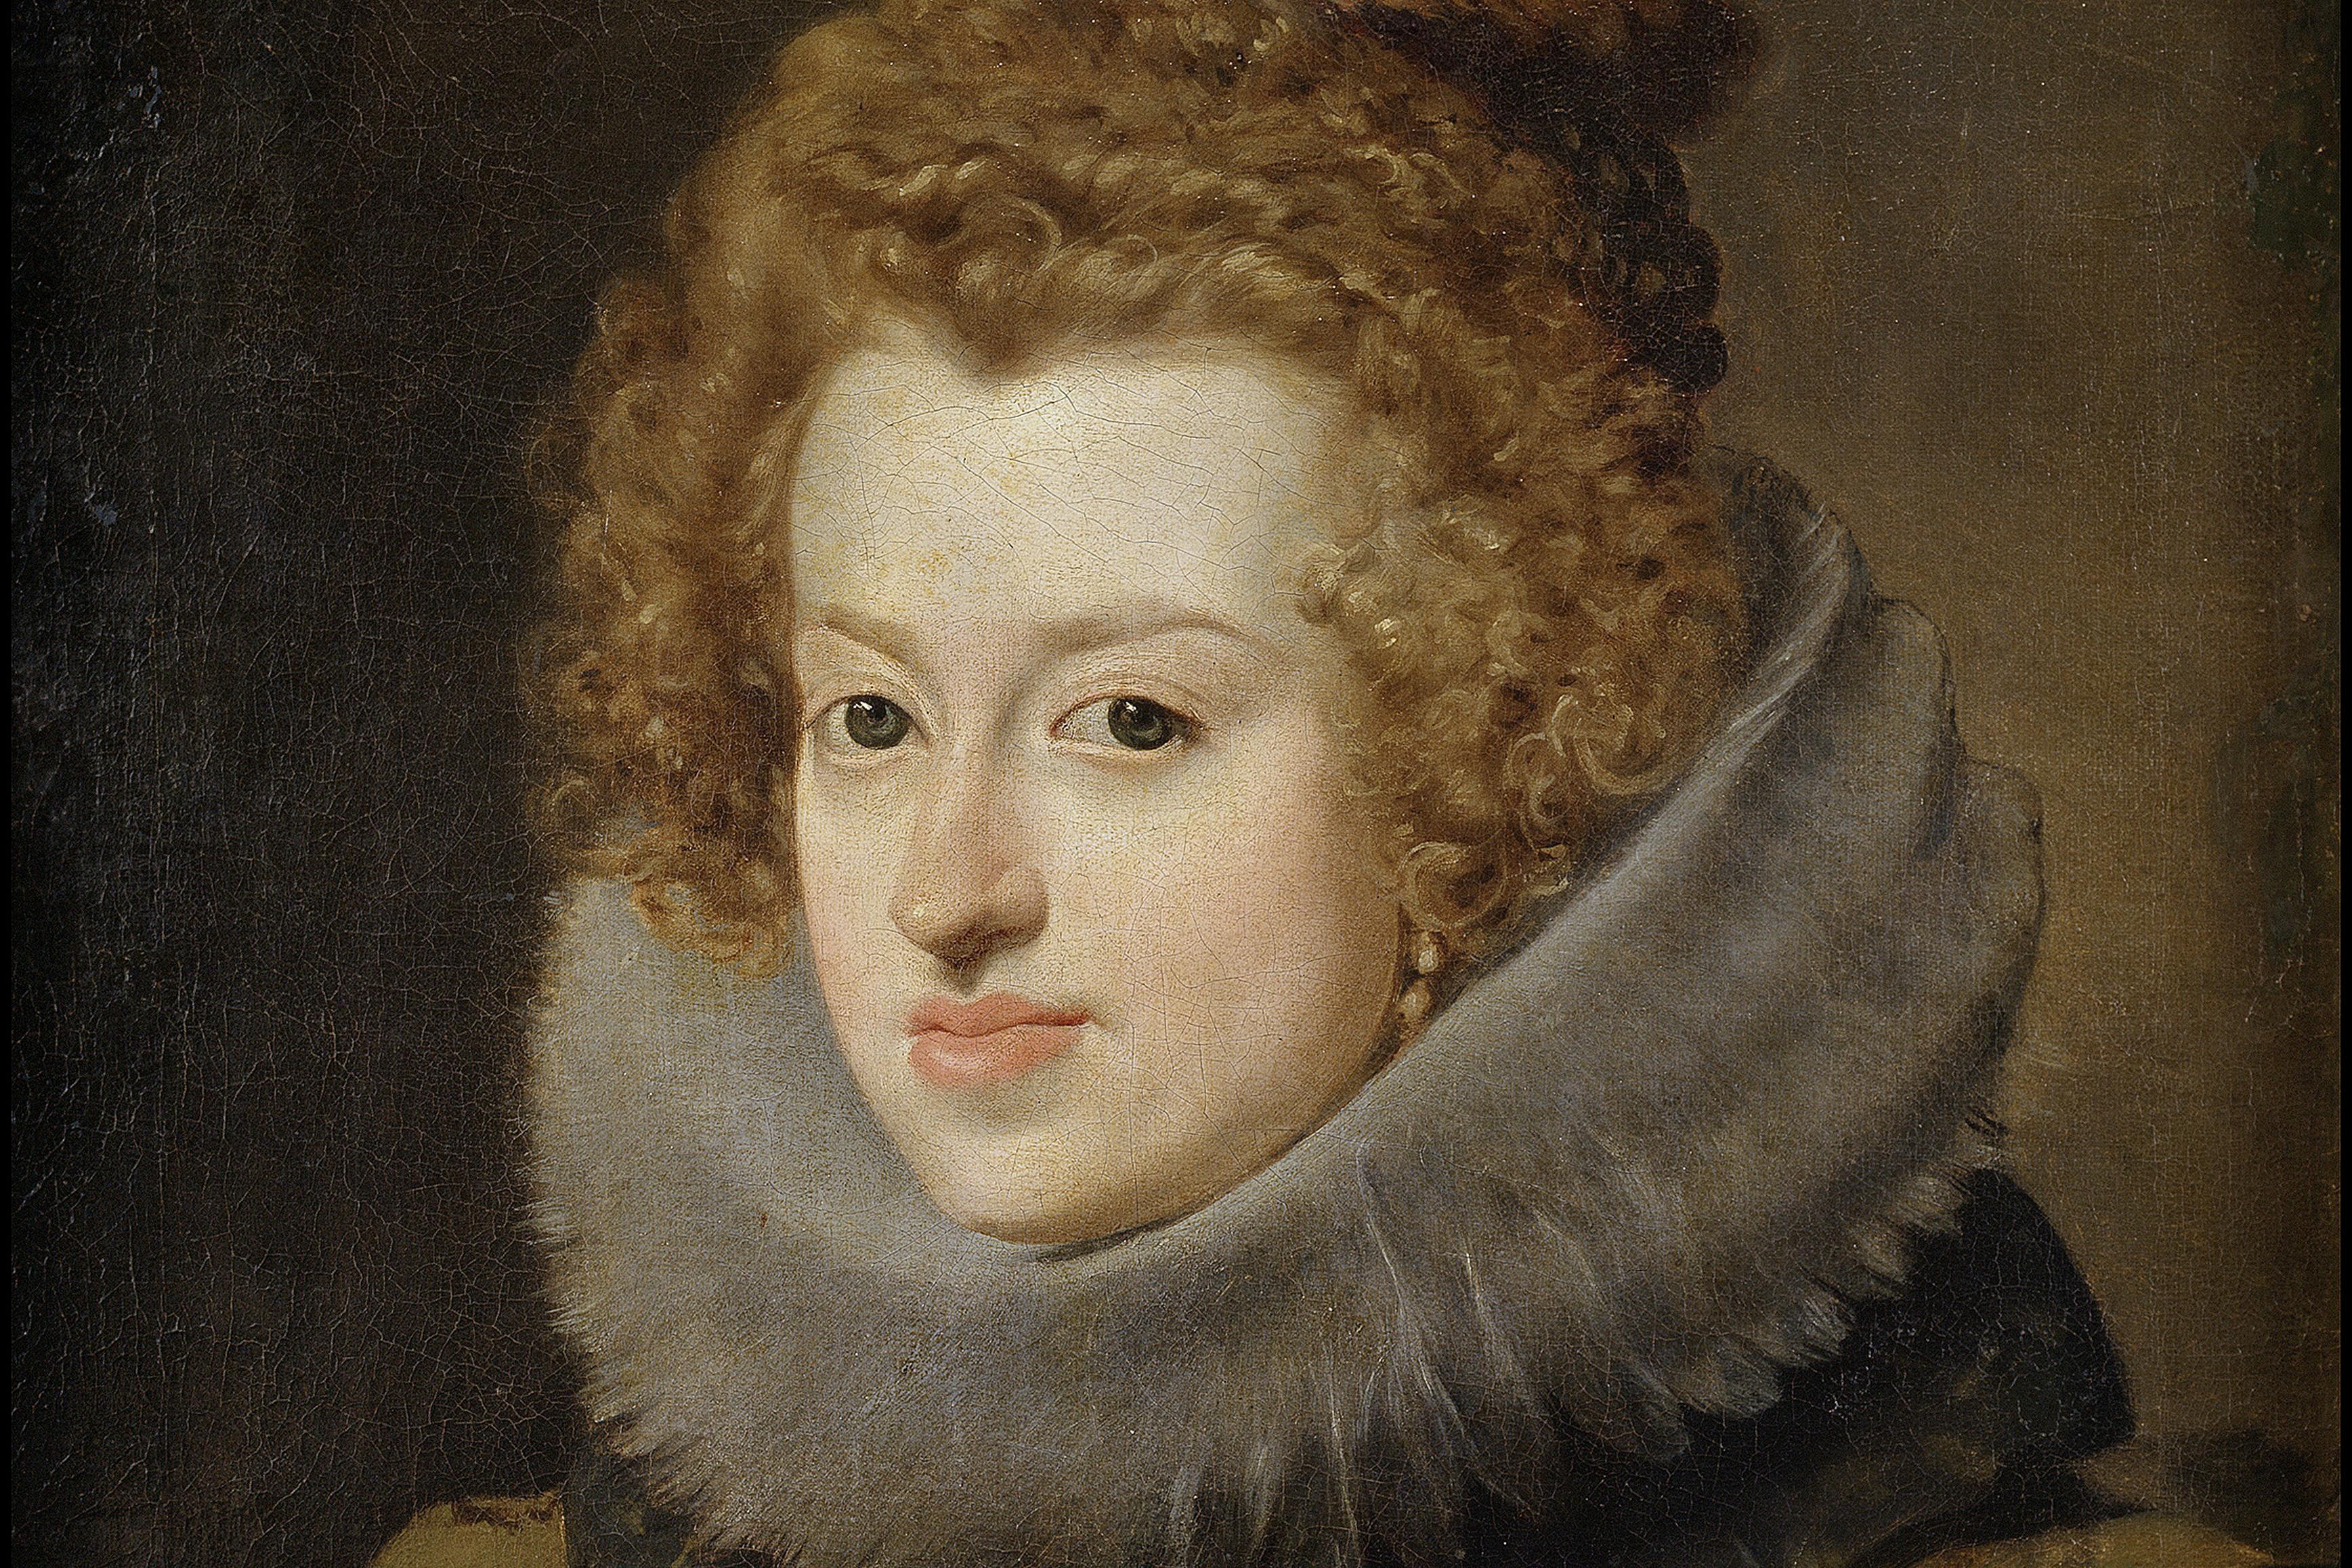 Maria Anna, Infanta of Spain